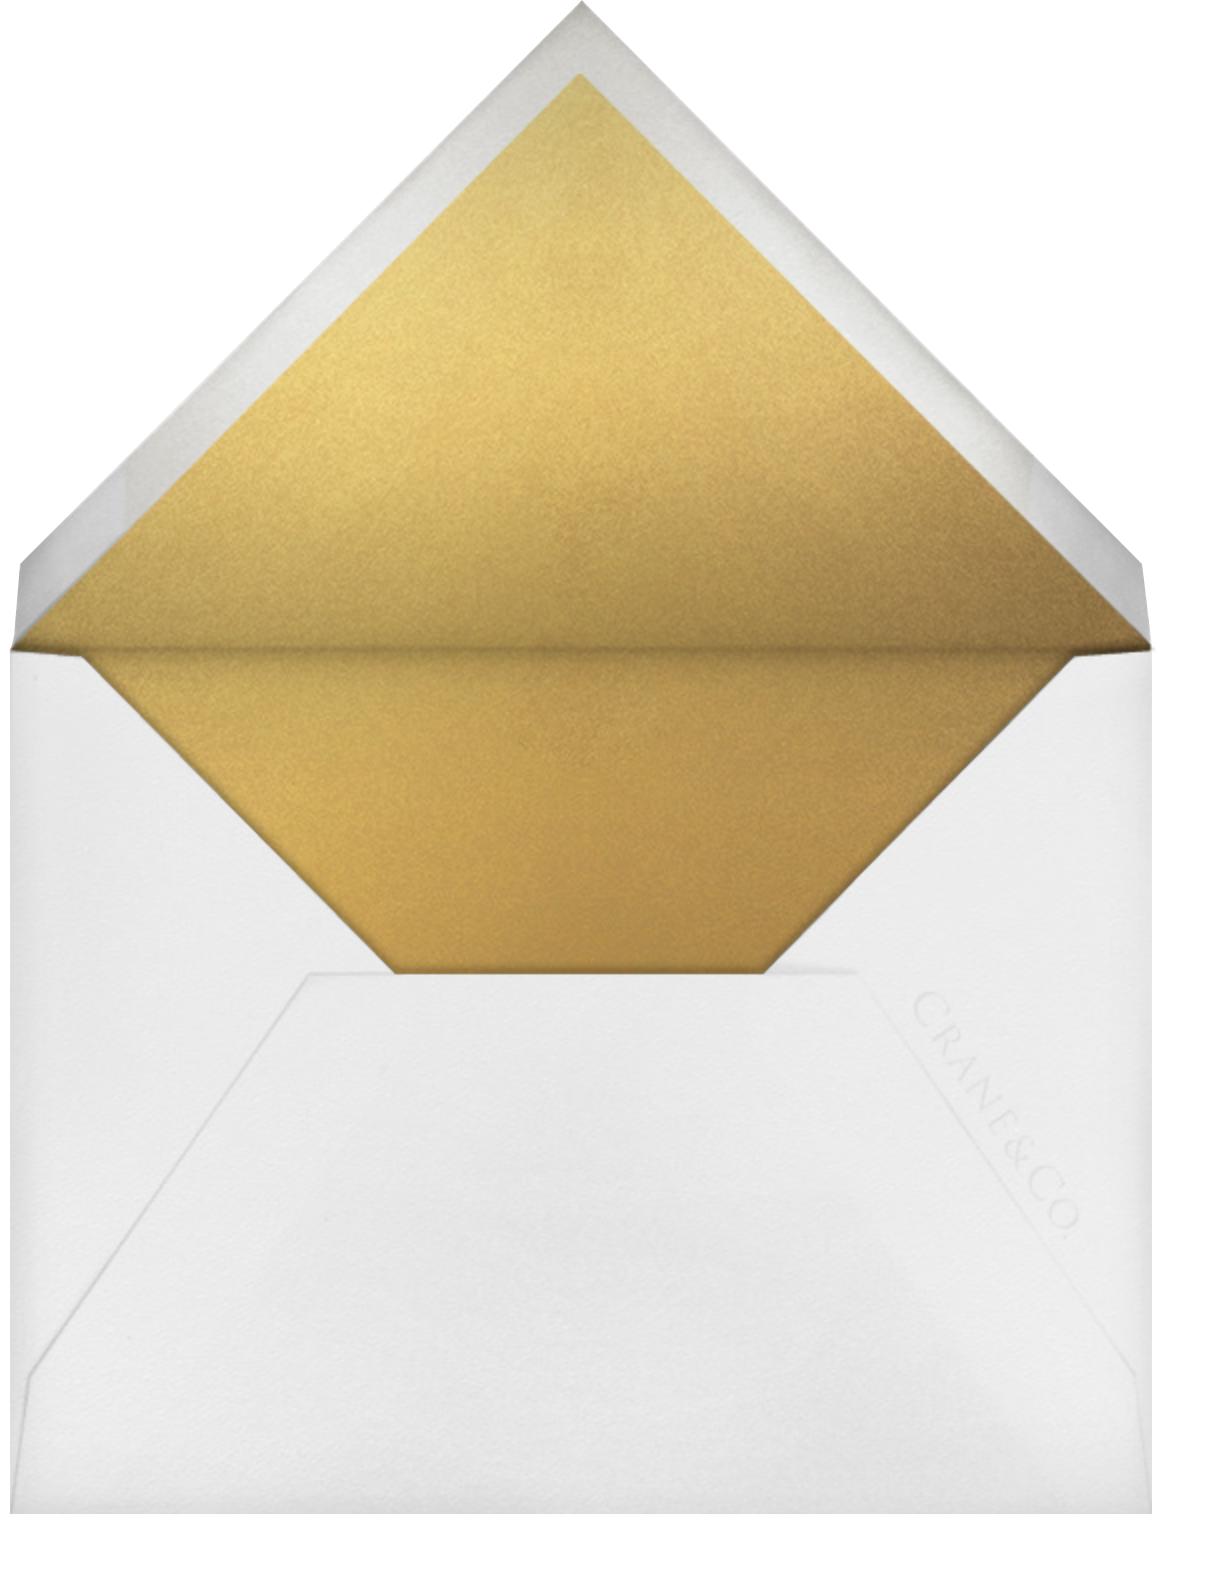 Coromandel (Invitation) - Paperless Post - null - envelope back